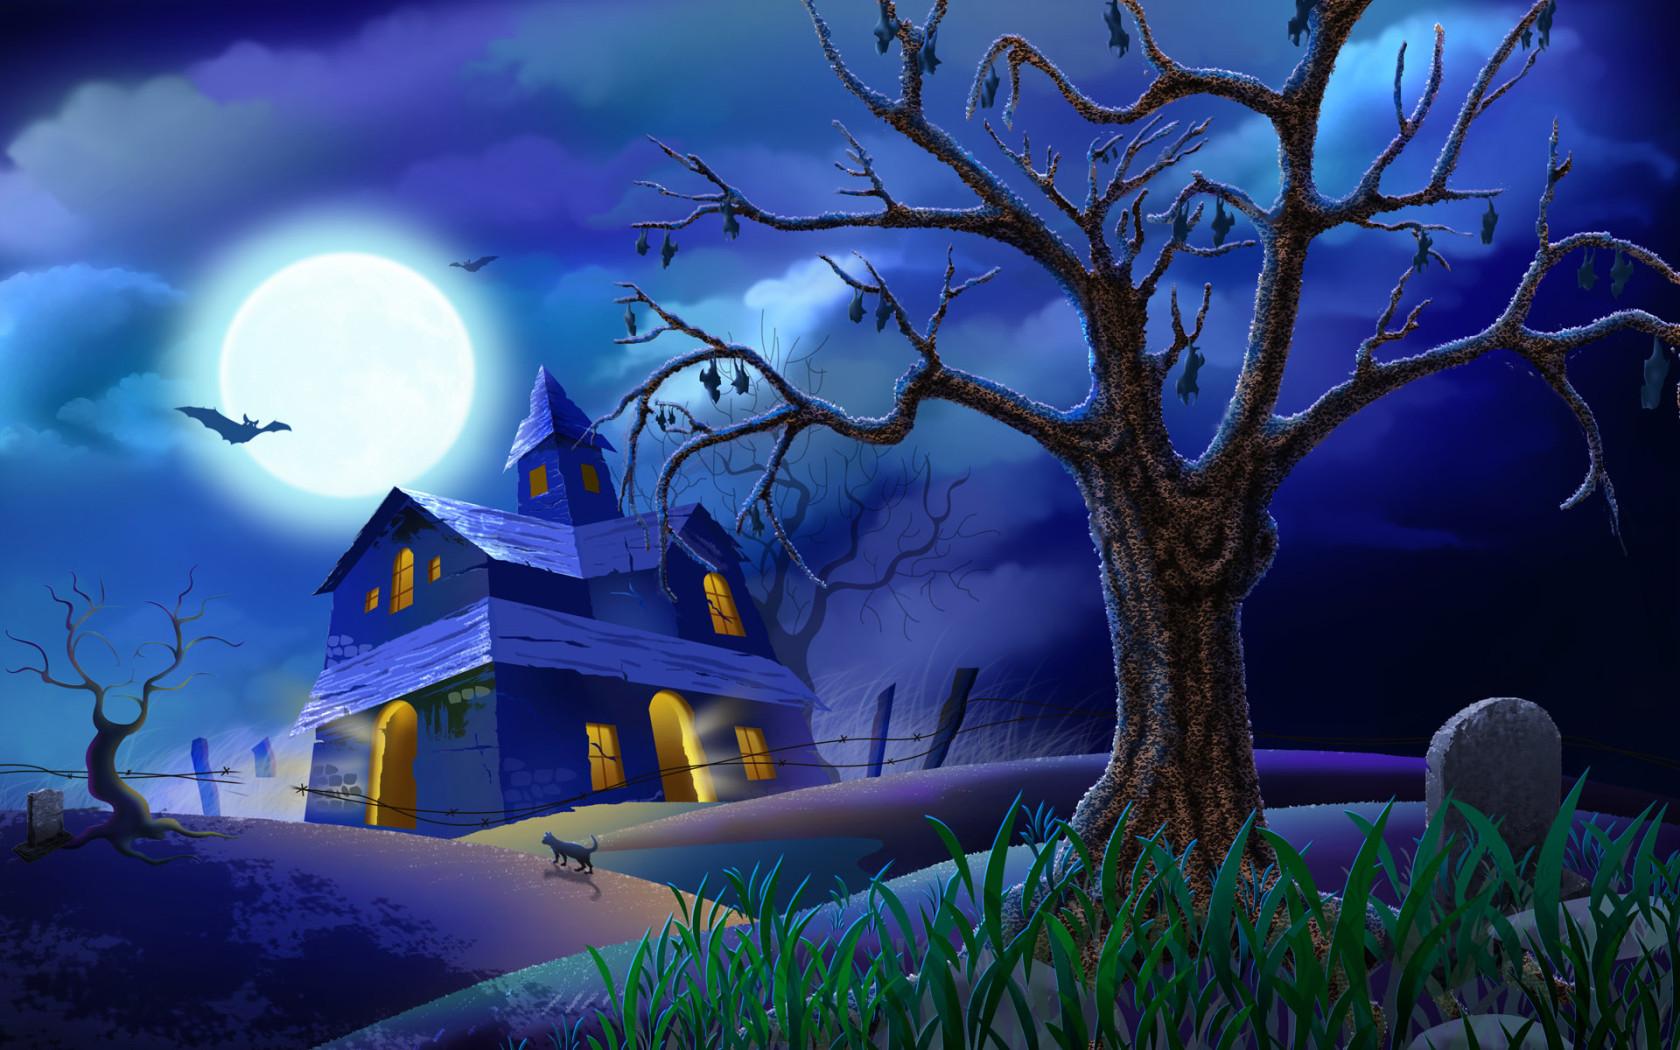 Fondos De Escritorio Gratis: Fondos De Escritorio De Halloween Gratis